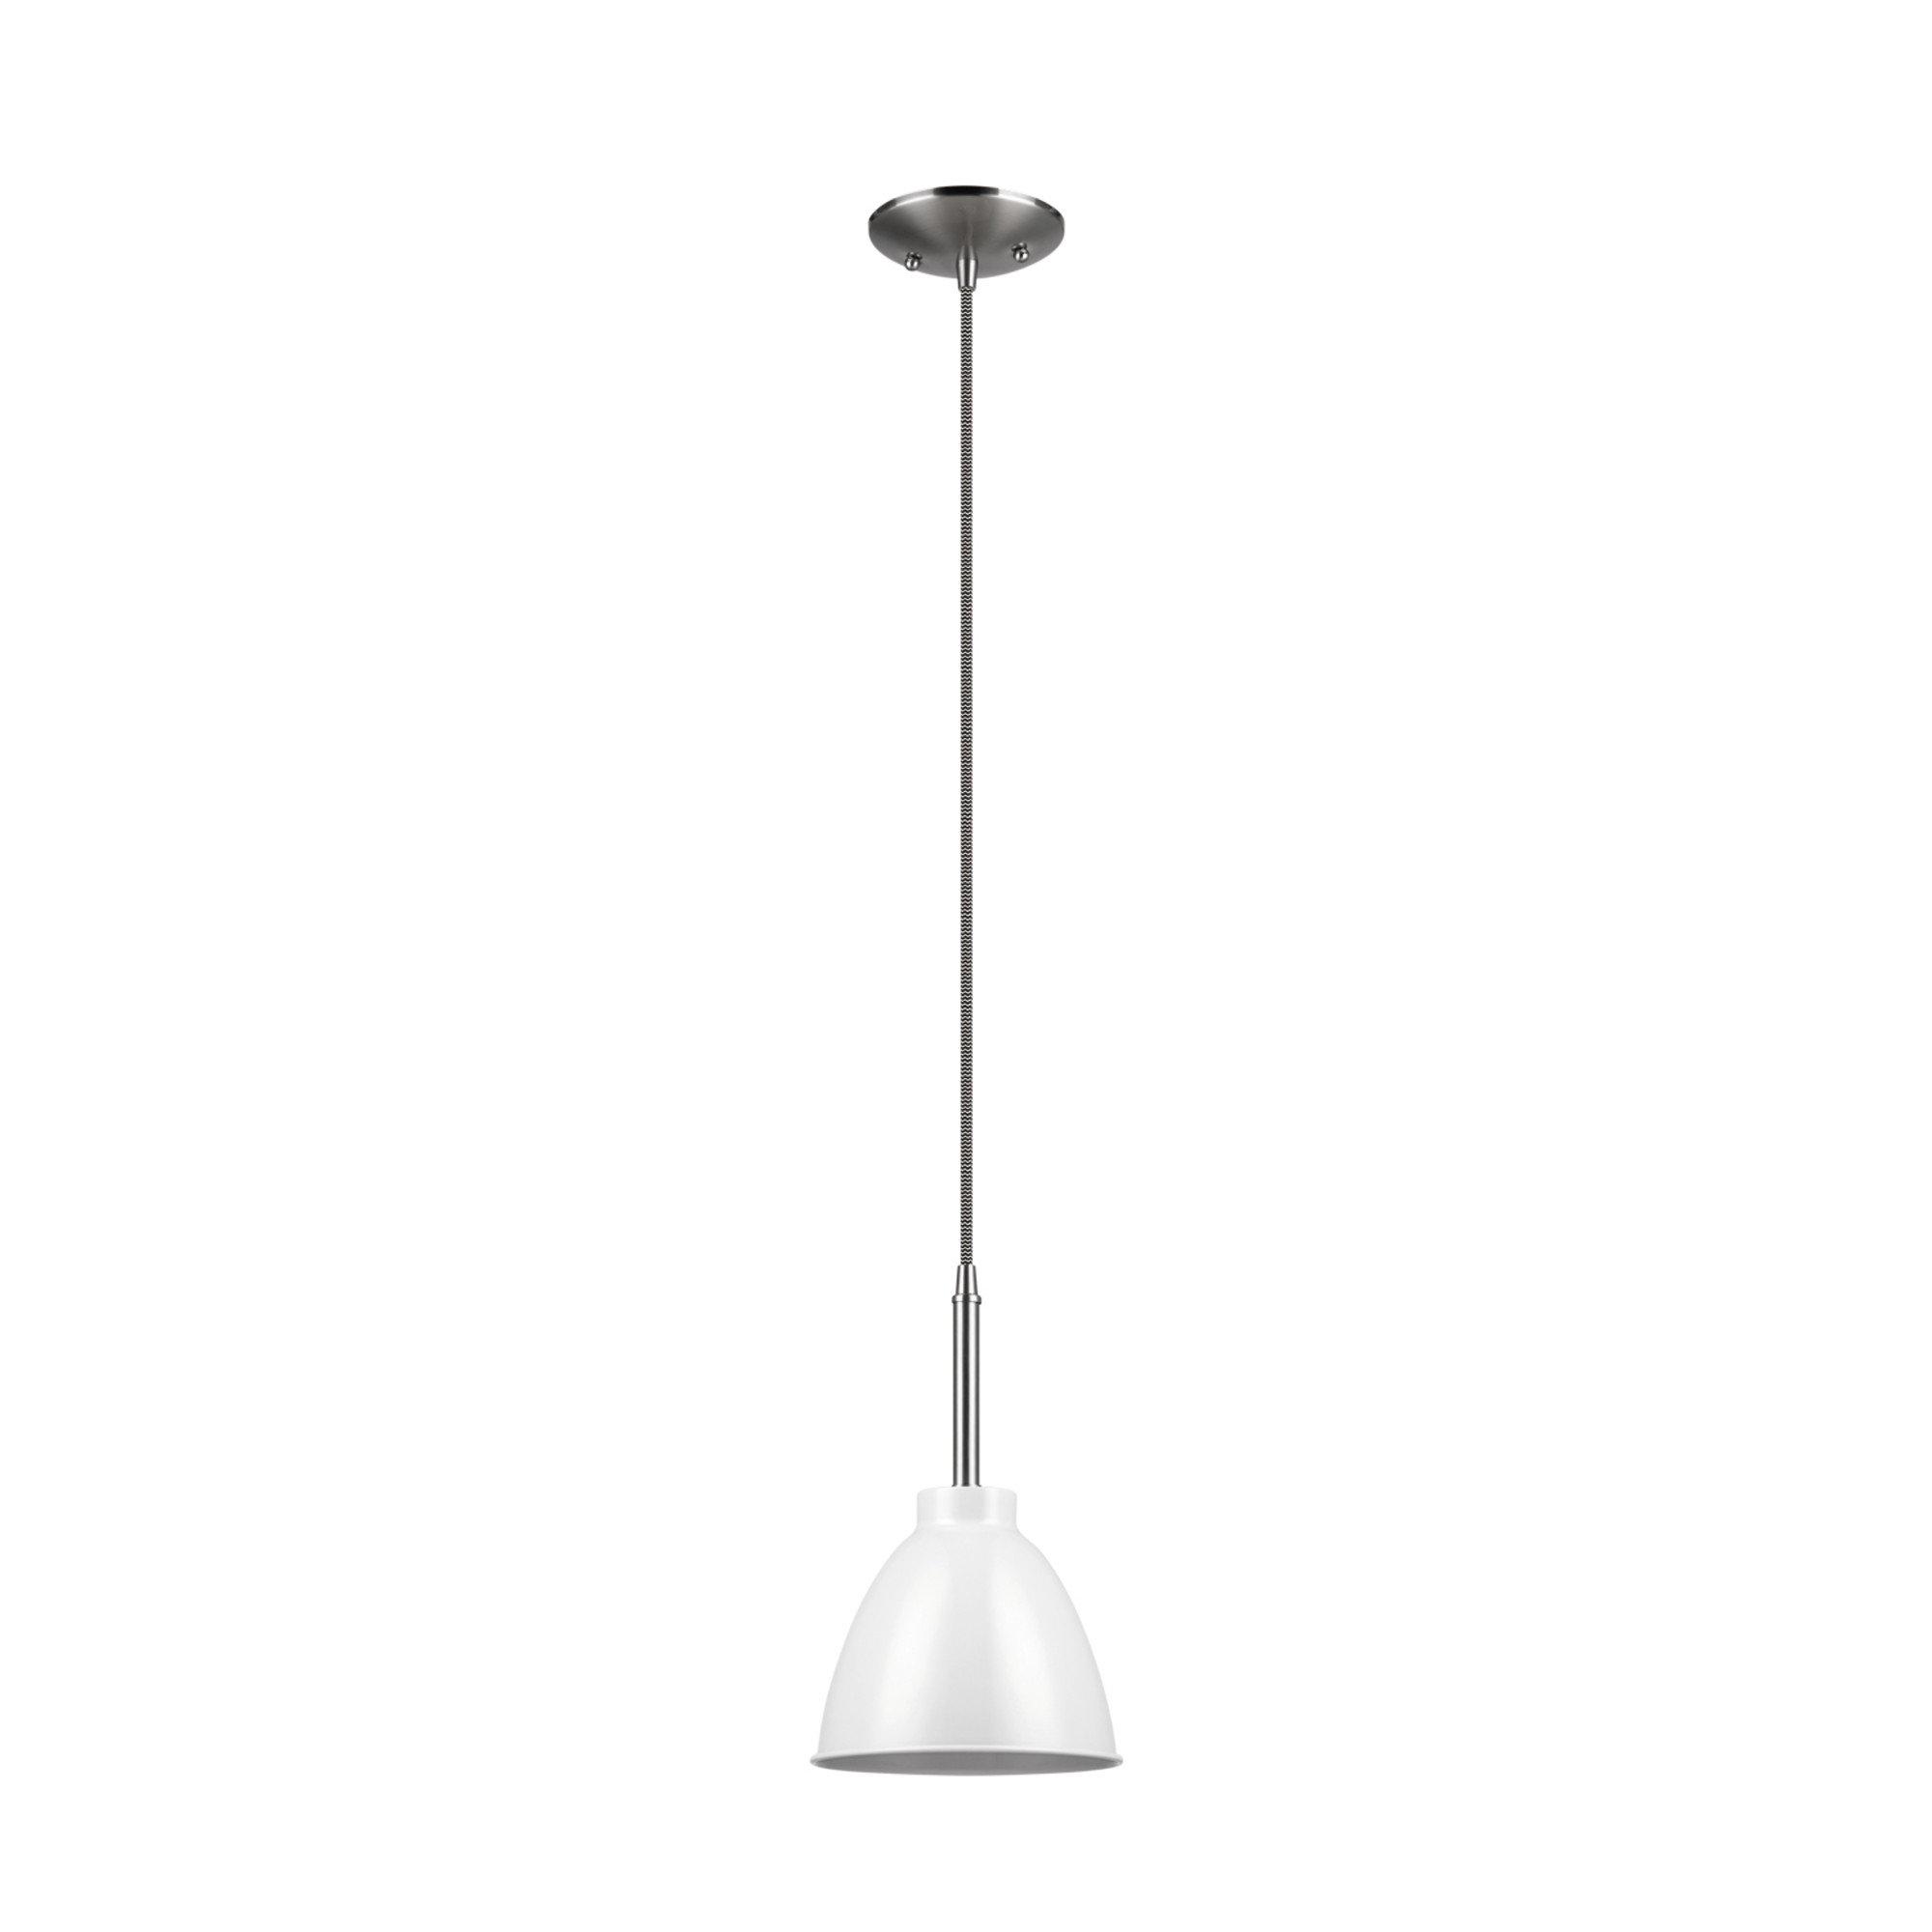 Velda 1 Light Single Bell Pendant Pertaining To 1 Light Single Bell Pendants (View 29 of 30)